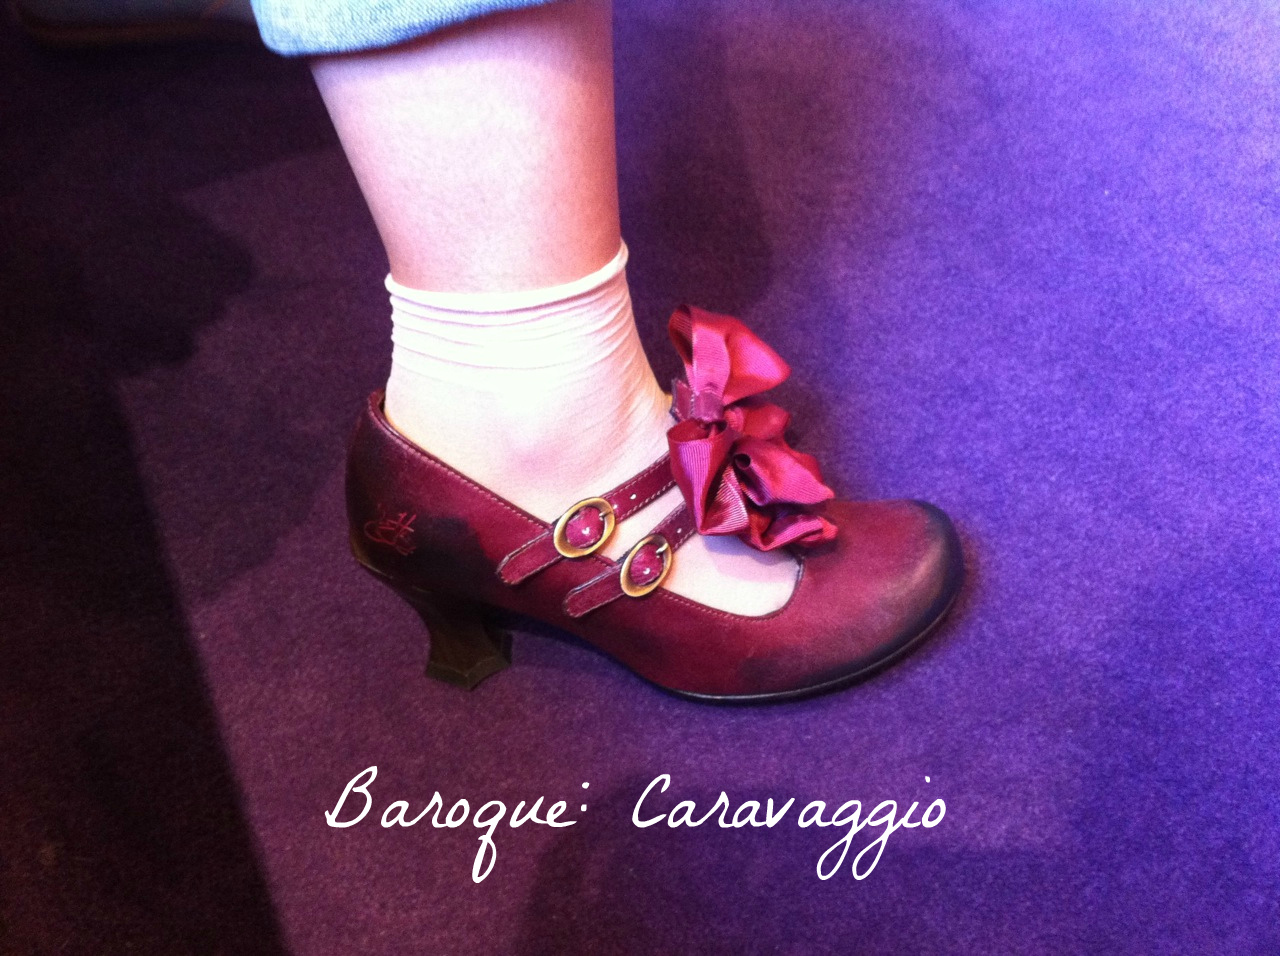 Baroque: Caravaggio